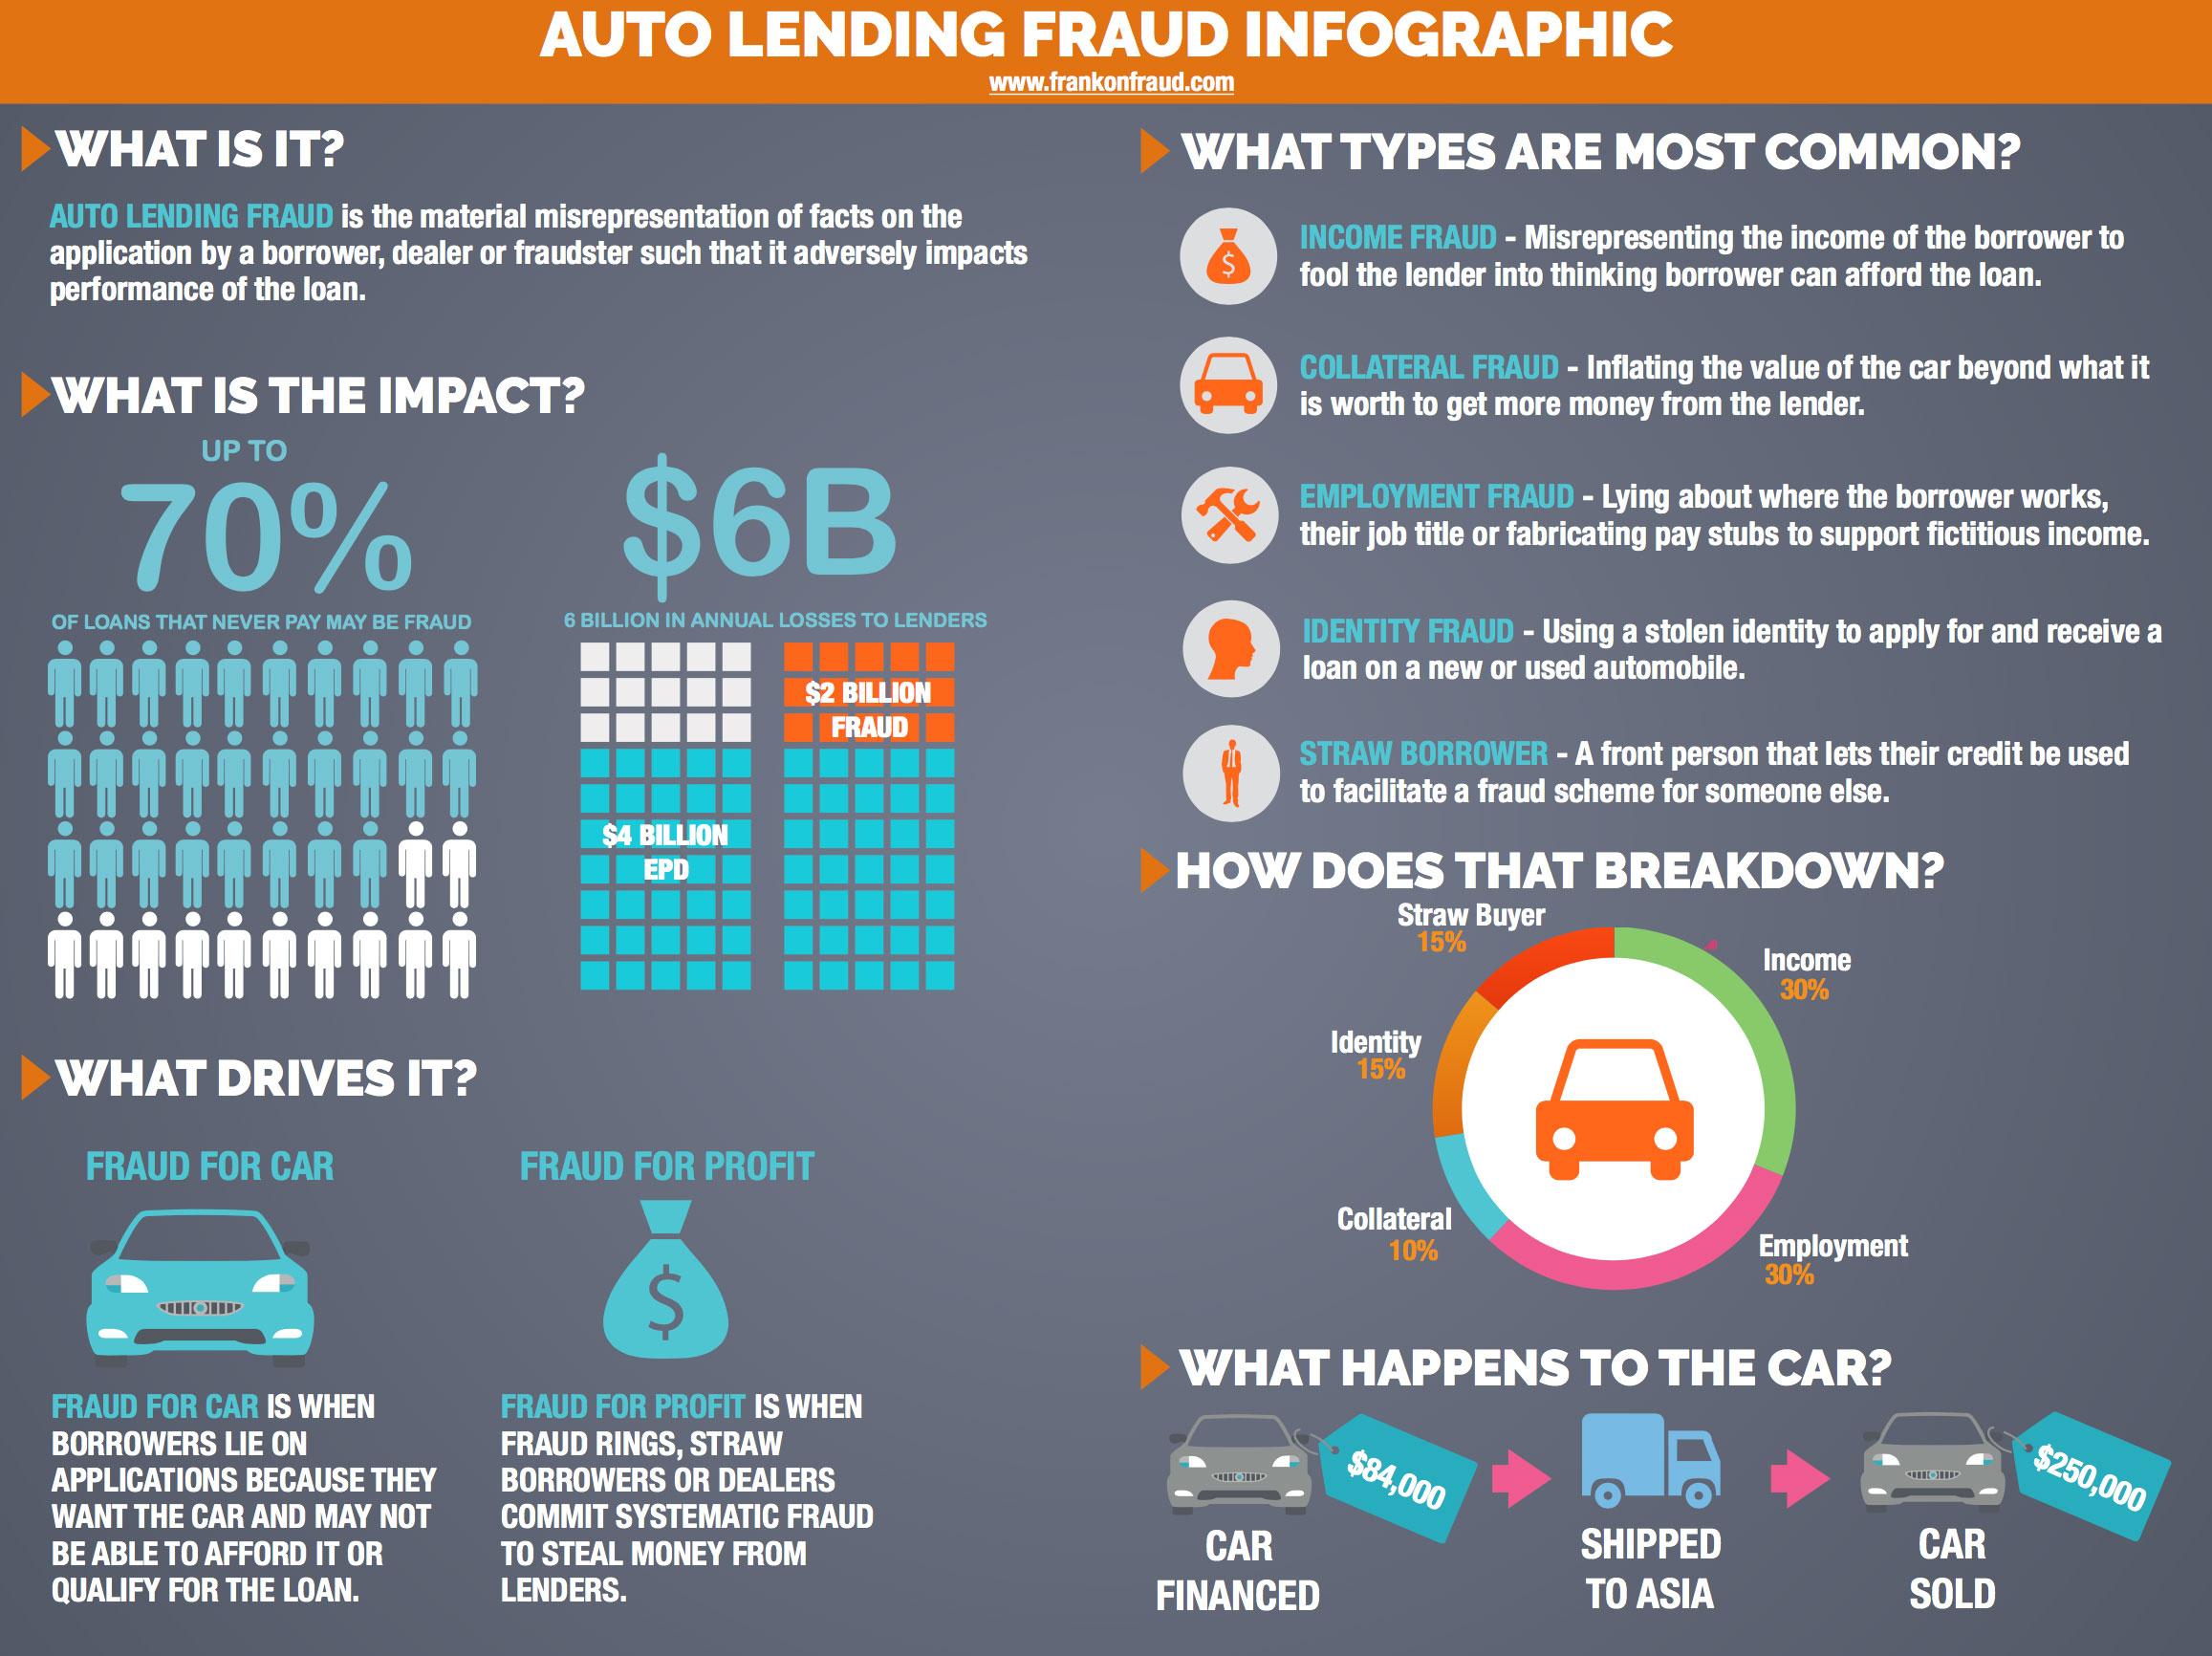 auto lending fraud infographic frank on fraud. Black Bedroom Furniture Sets. Home Design Ideas